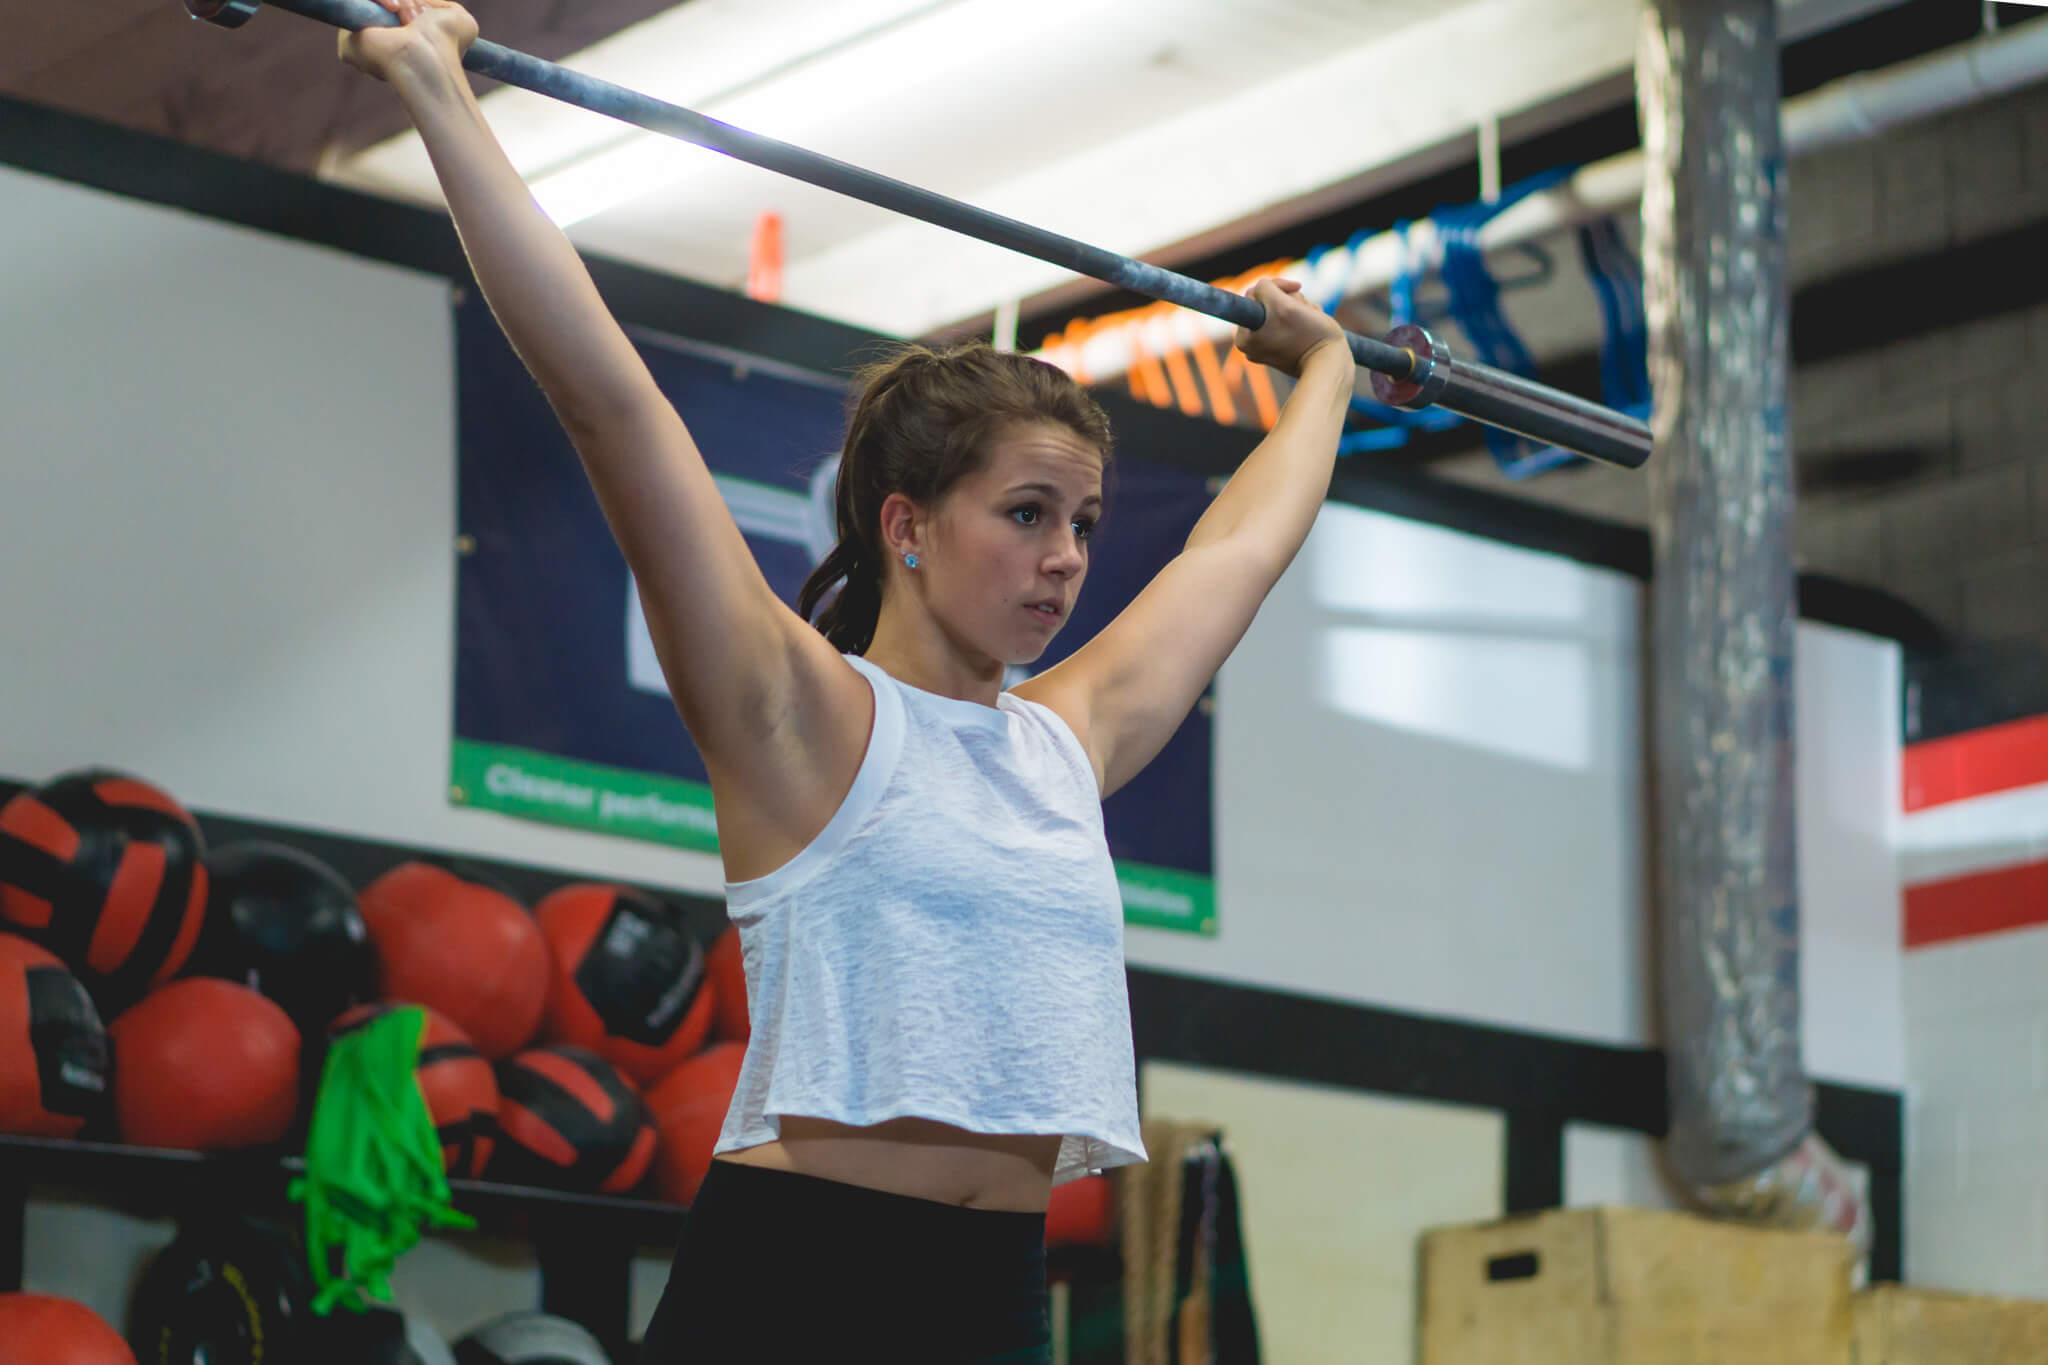 Girl weightlifting while avoiding injury